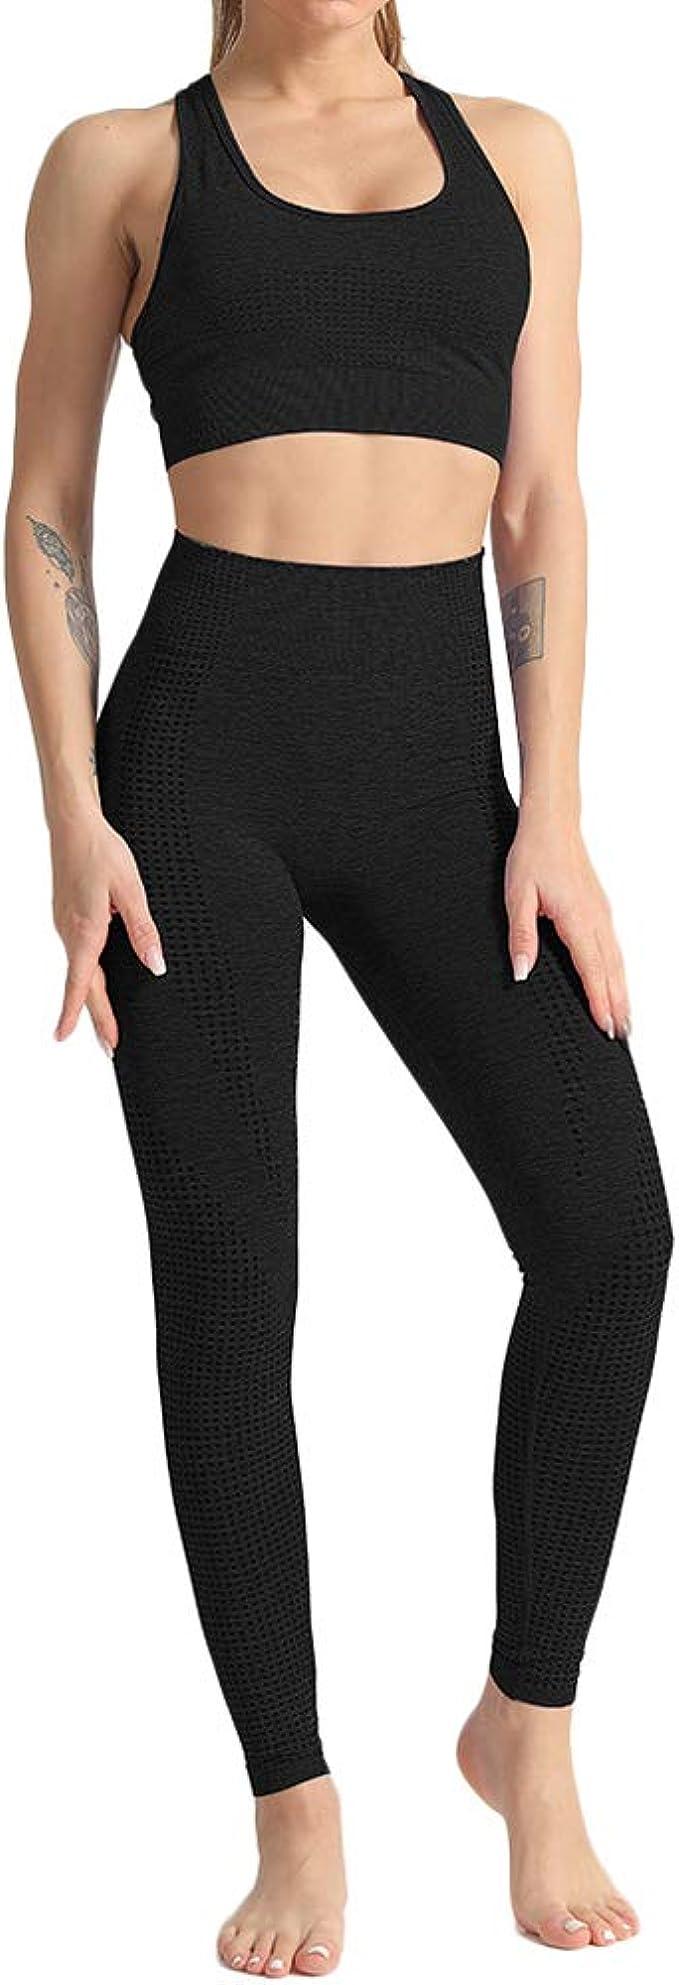 Mooyii Damen Fitness Bekleidung Sportanzug Sportswear Yoga Anz/üge Stretch Fit Gym Wear Set